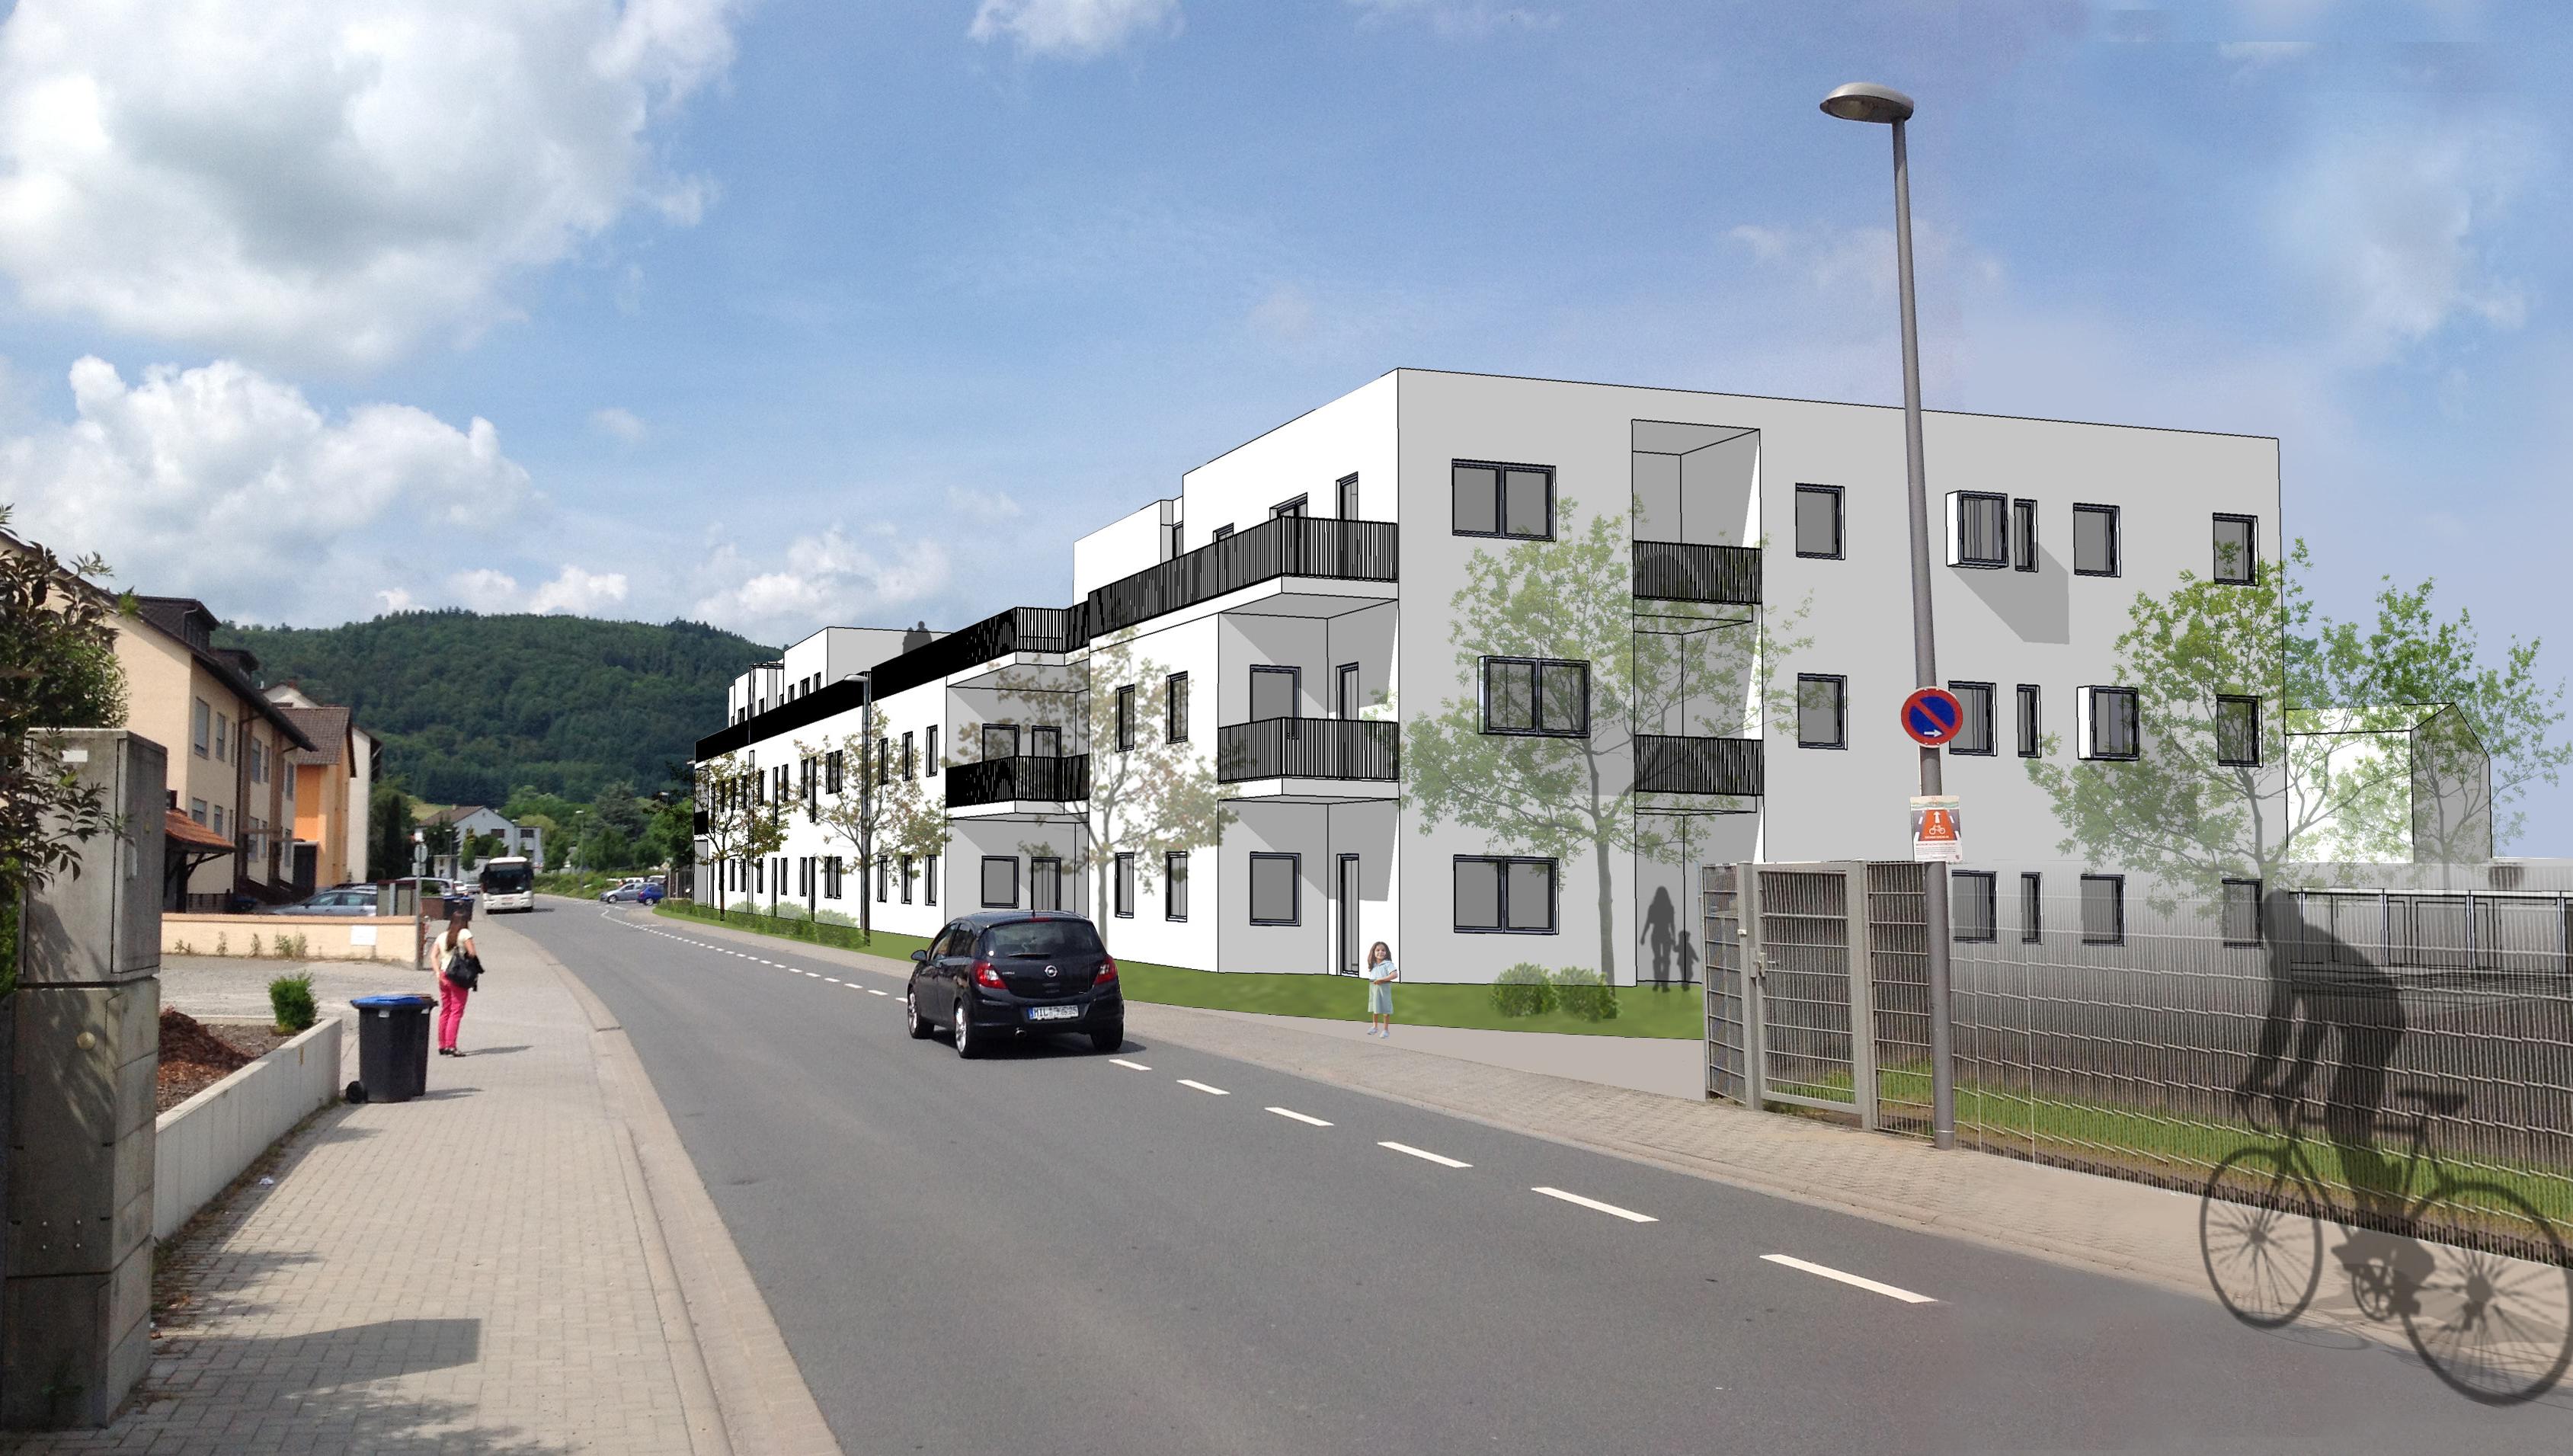 Immobilienmakler Miltenberg exklusive gewerbefläche in miltenberg ac immobilien